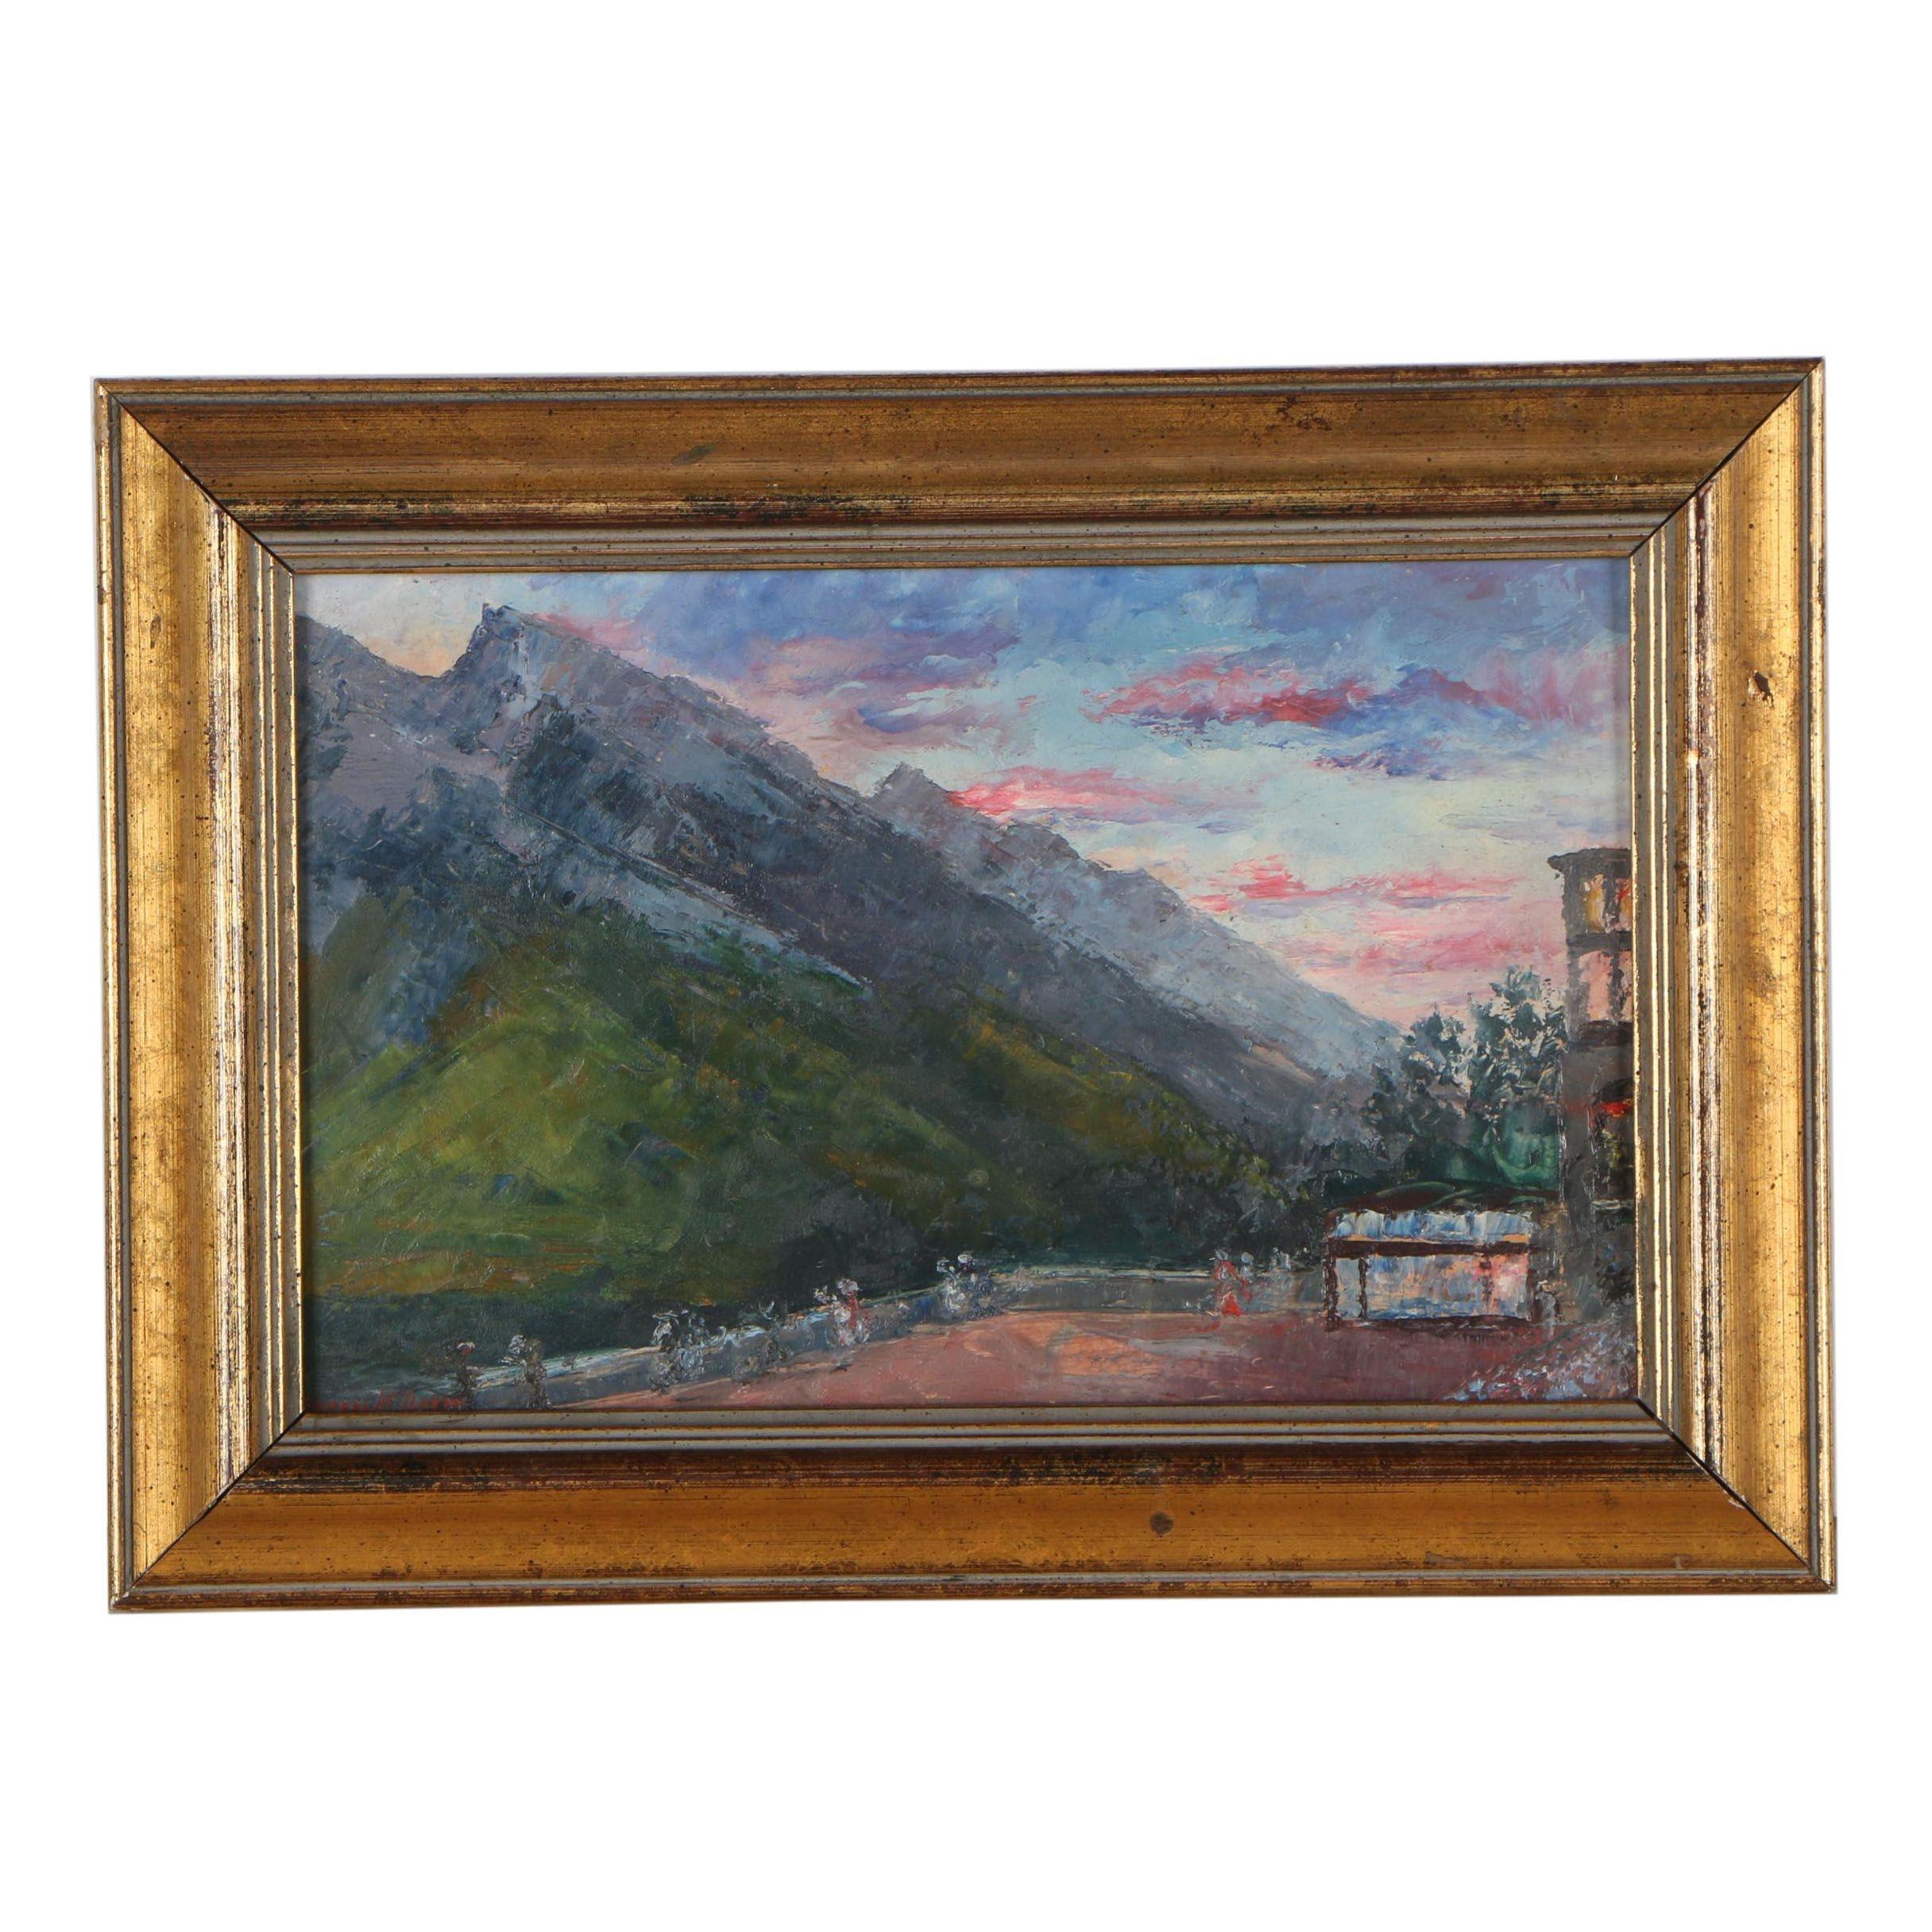 Leonard M. Davis Landscape Oil Painting, 1928